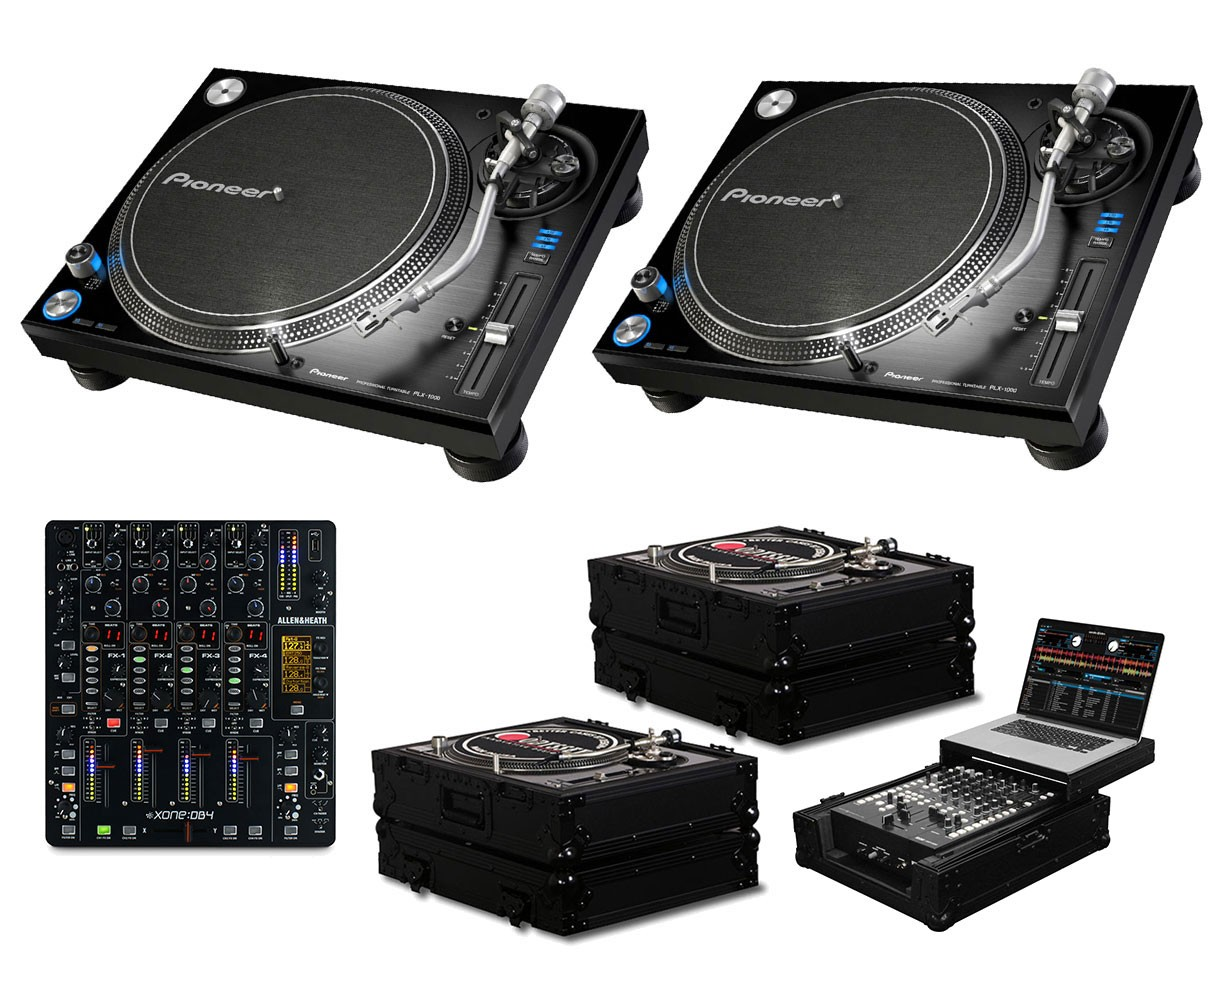 2x Pioneer PLX-1000 + Xone:DB4 + Black Label Cases + Glide Style Case